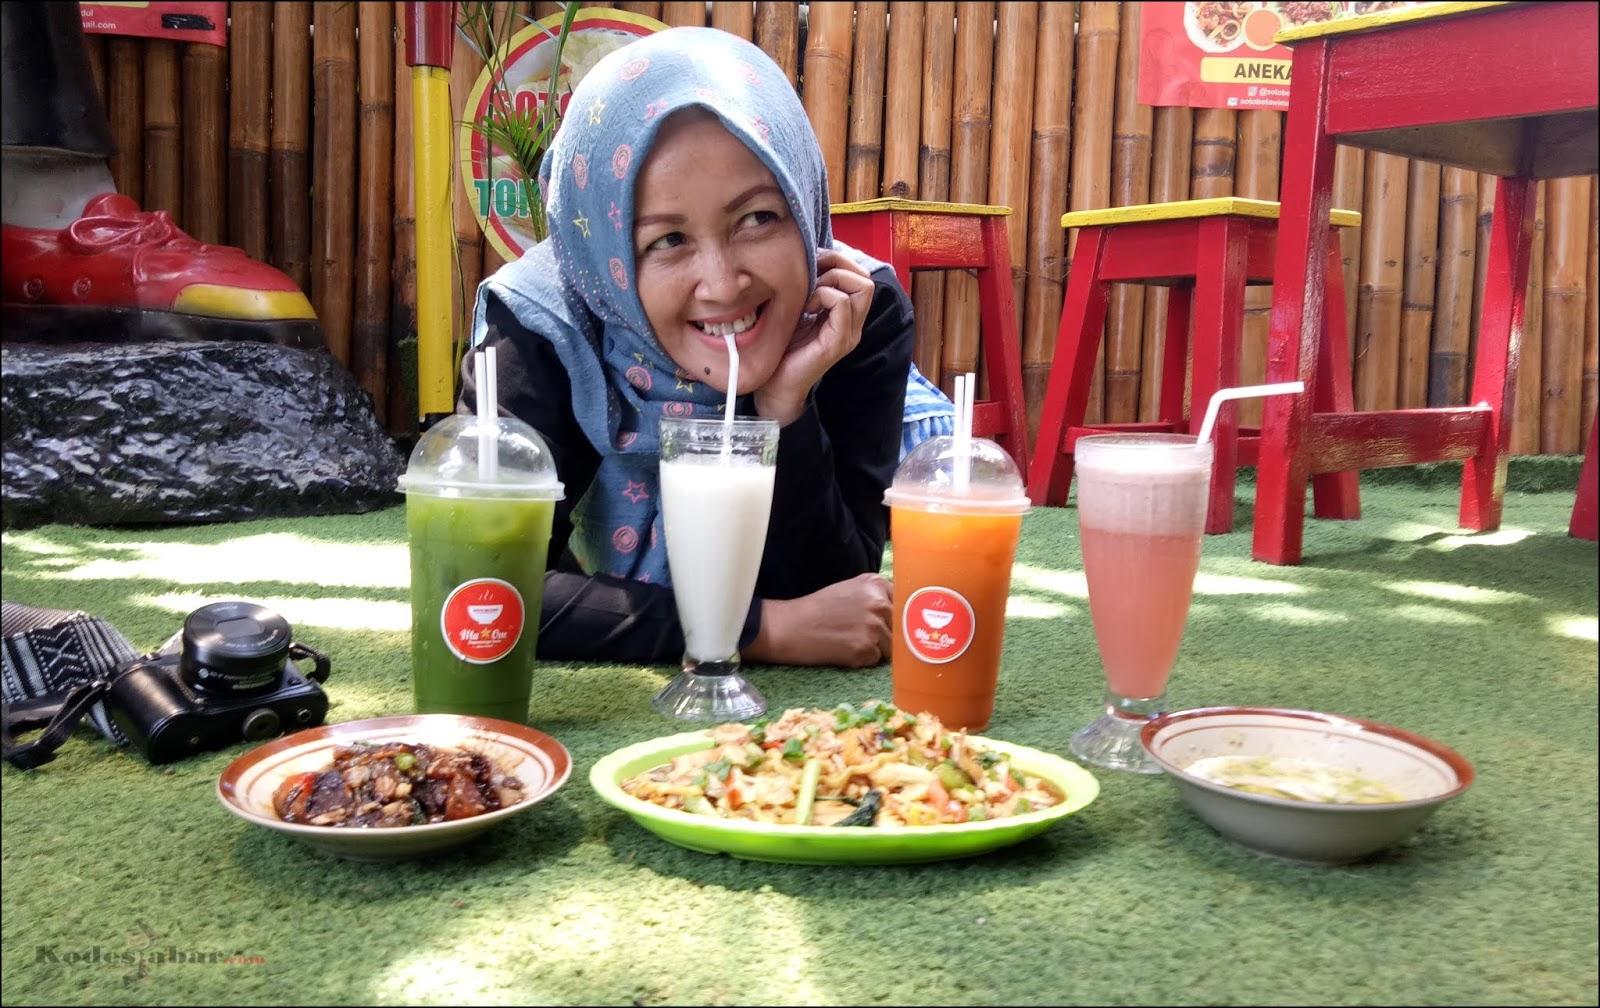 Tempat Kuliner Buat Soto Lover di Bandung Mastarone Dapoernya Soto, Tempat Kuliner Buat Soto Lover di Bandung